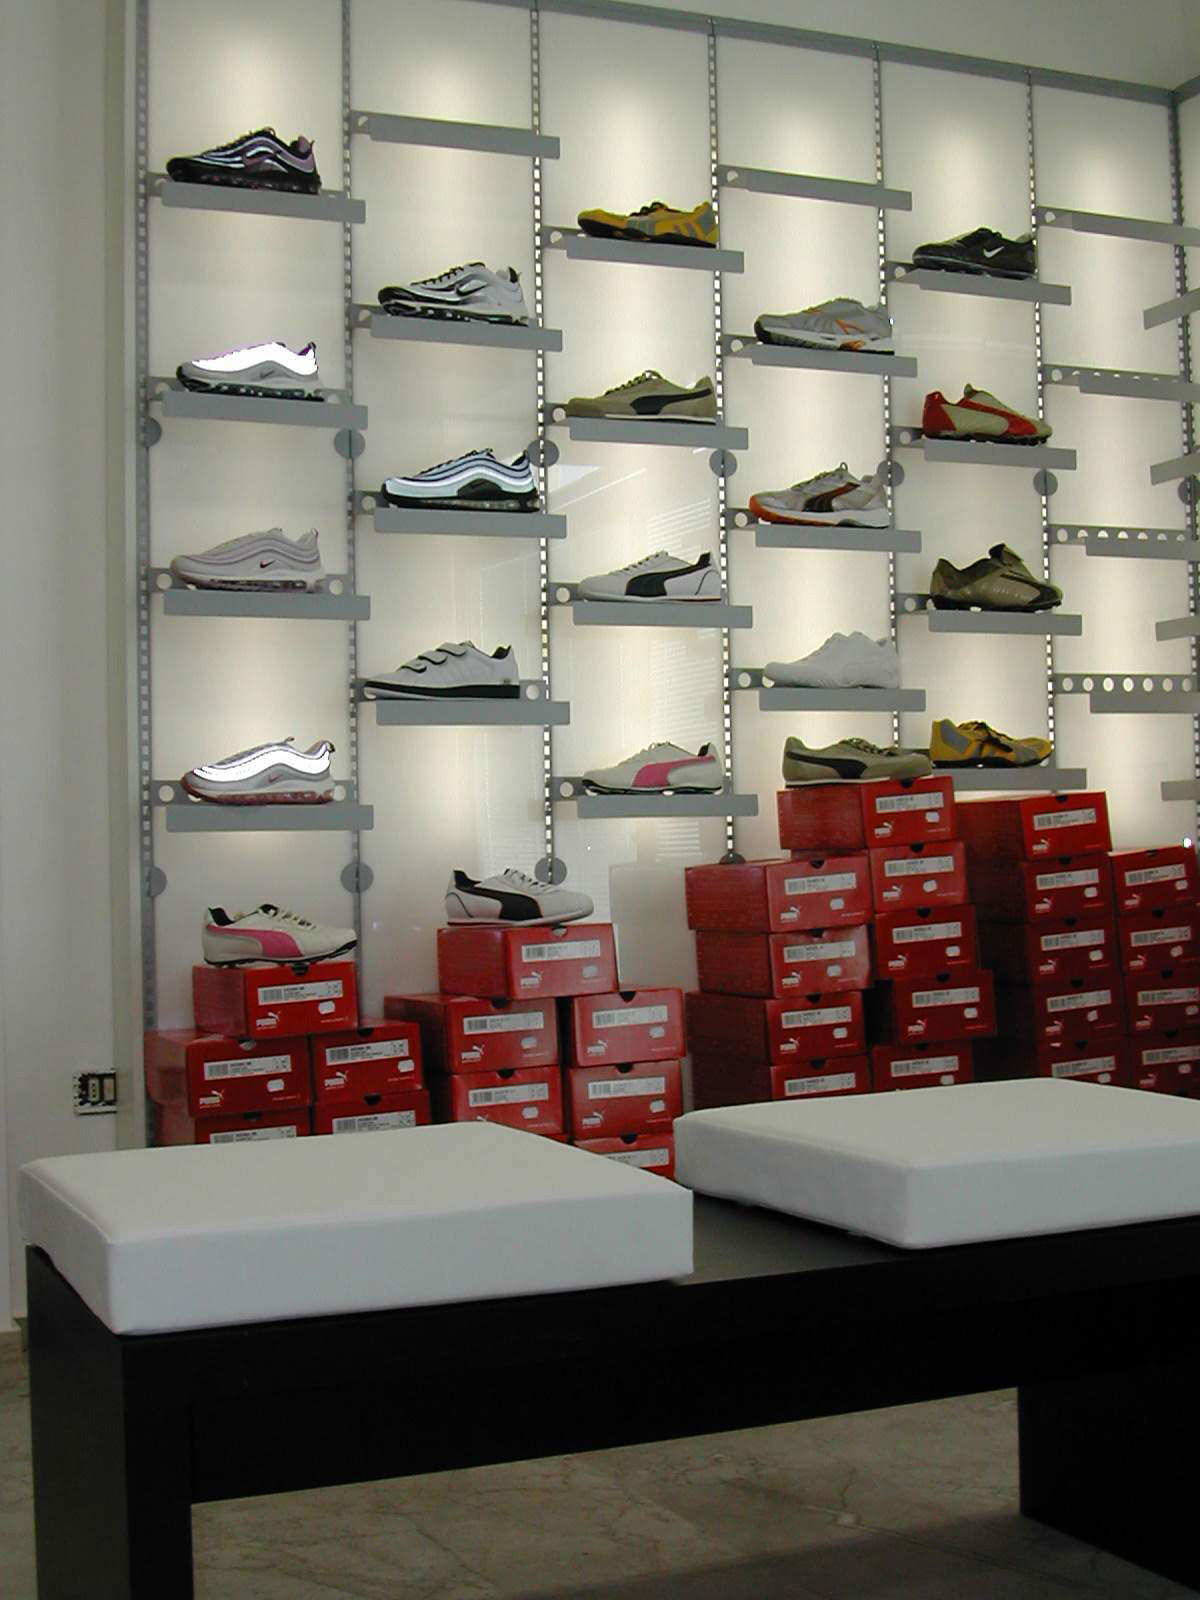 Arredamento per negozio di calzature toscana belardi arredamenti for Immagini arredamento